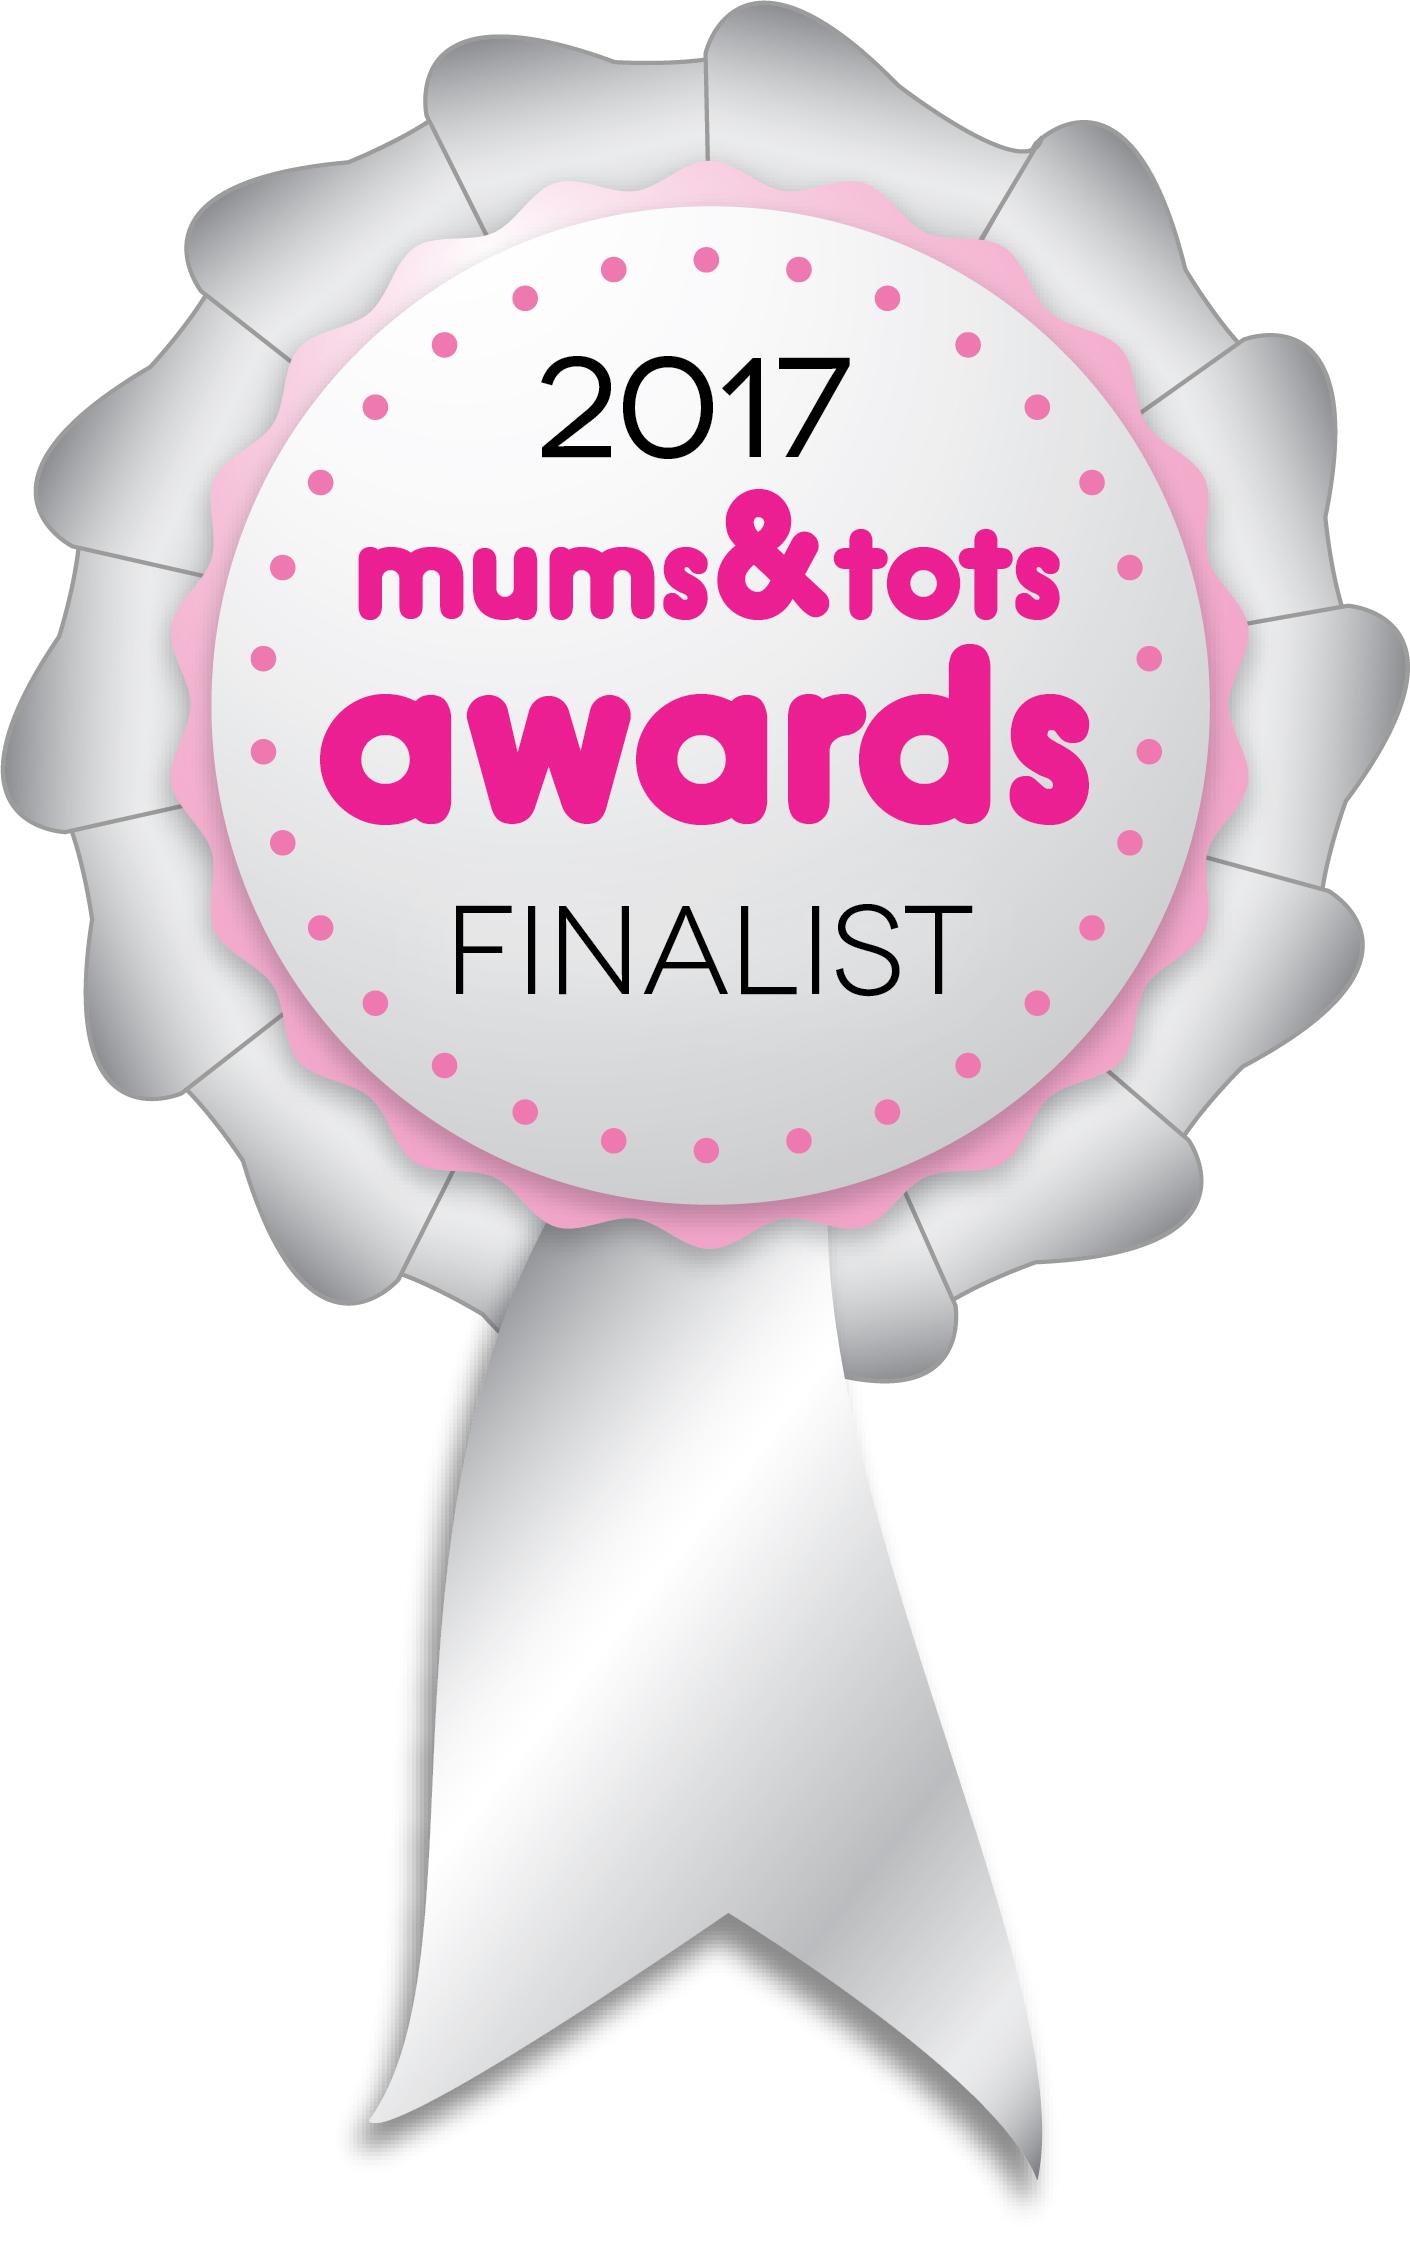 Mums-and-Tots-Awards-Finalist-Rosette-2017.jpg